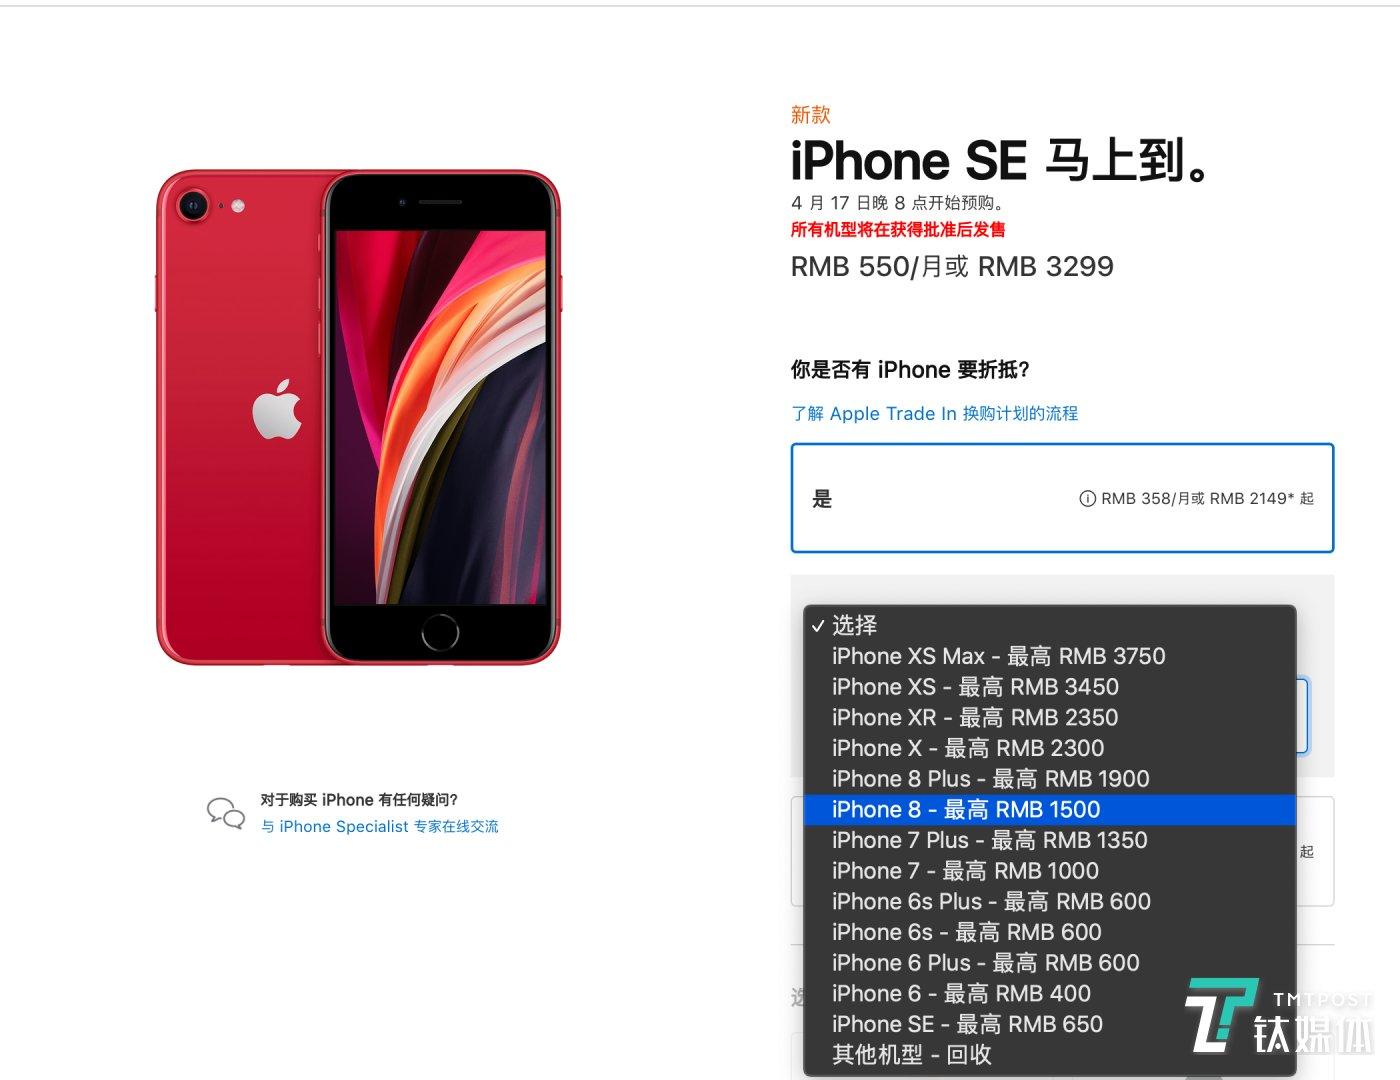 iPhone Xs Max 亦可折换